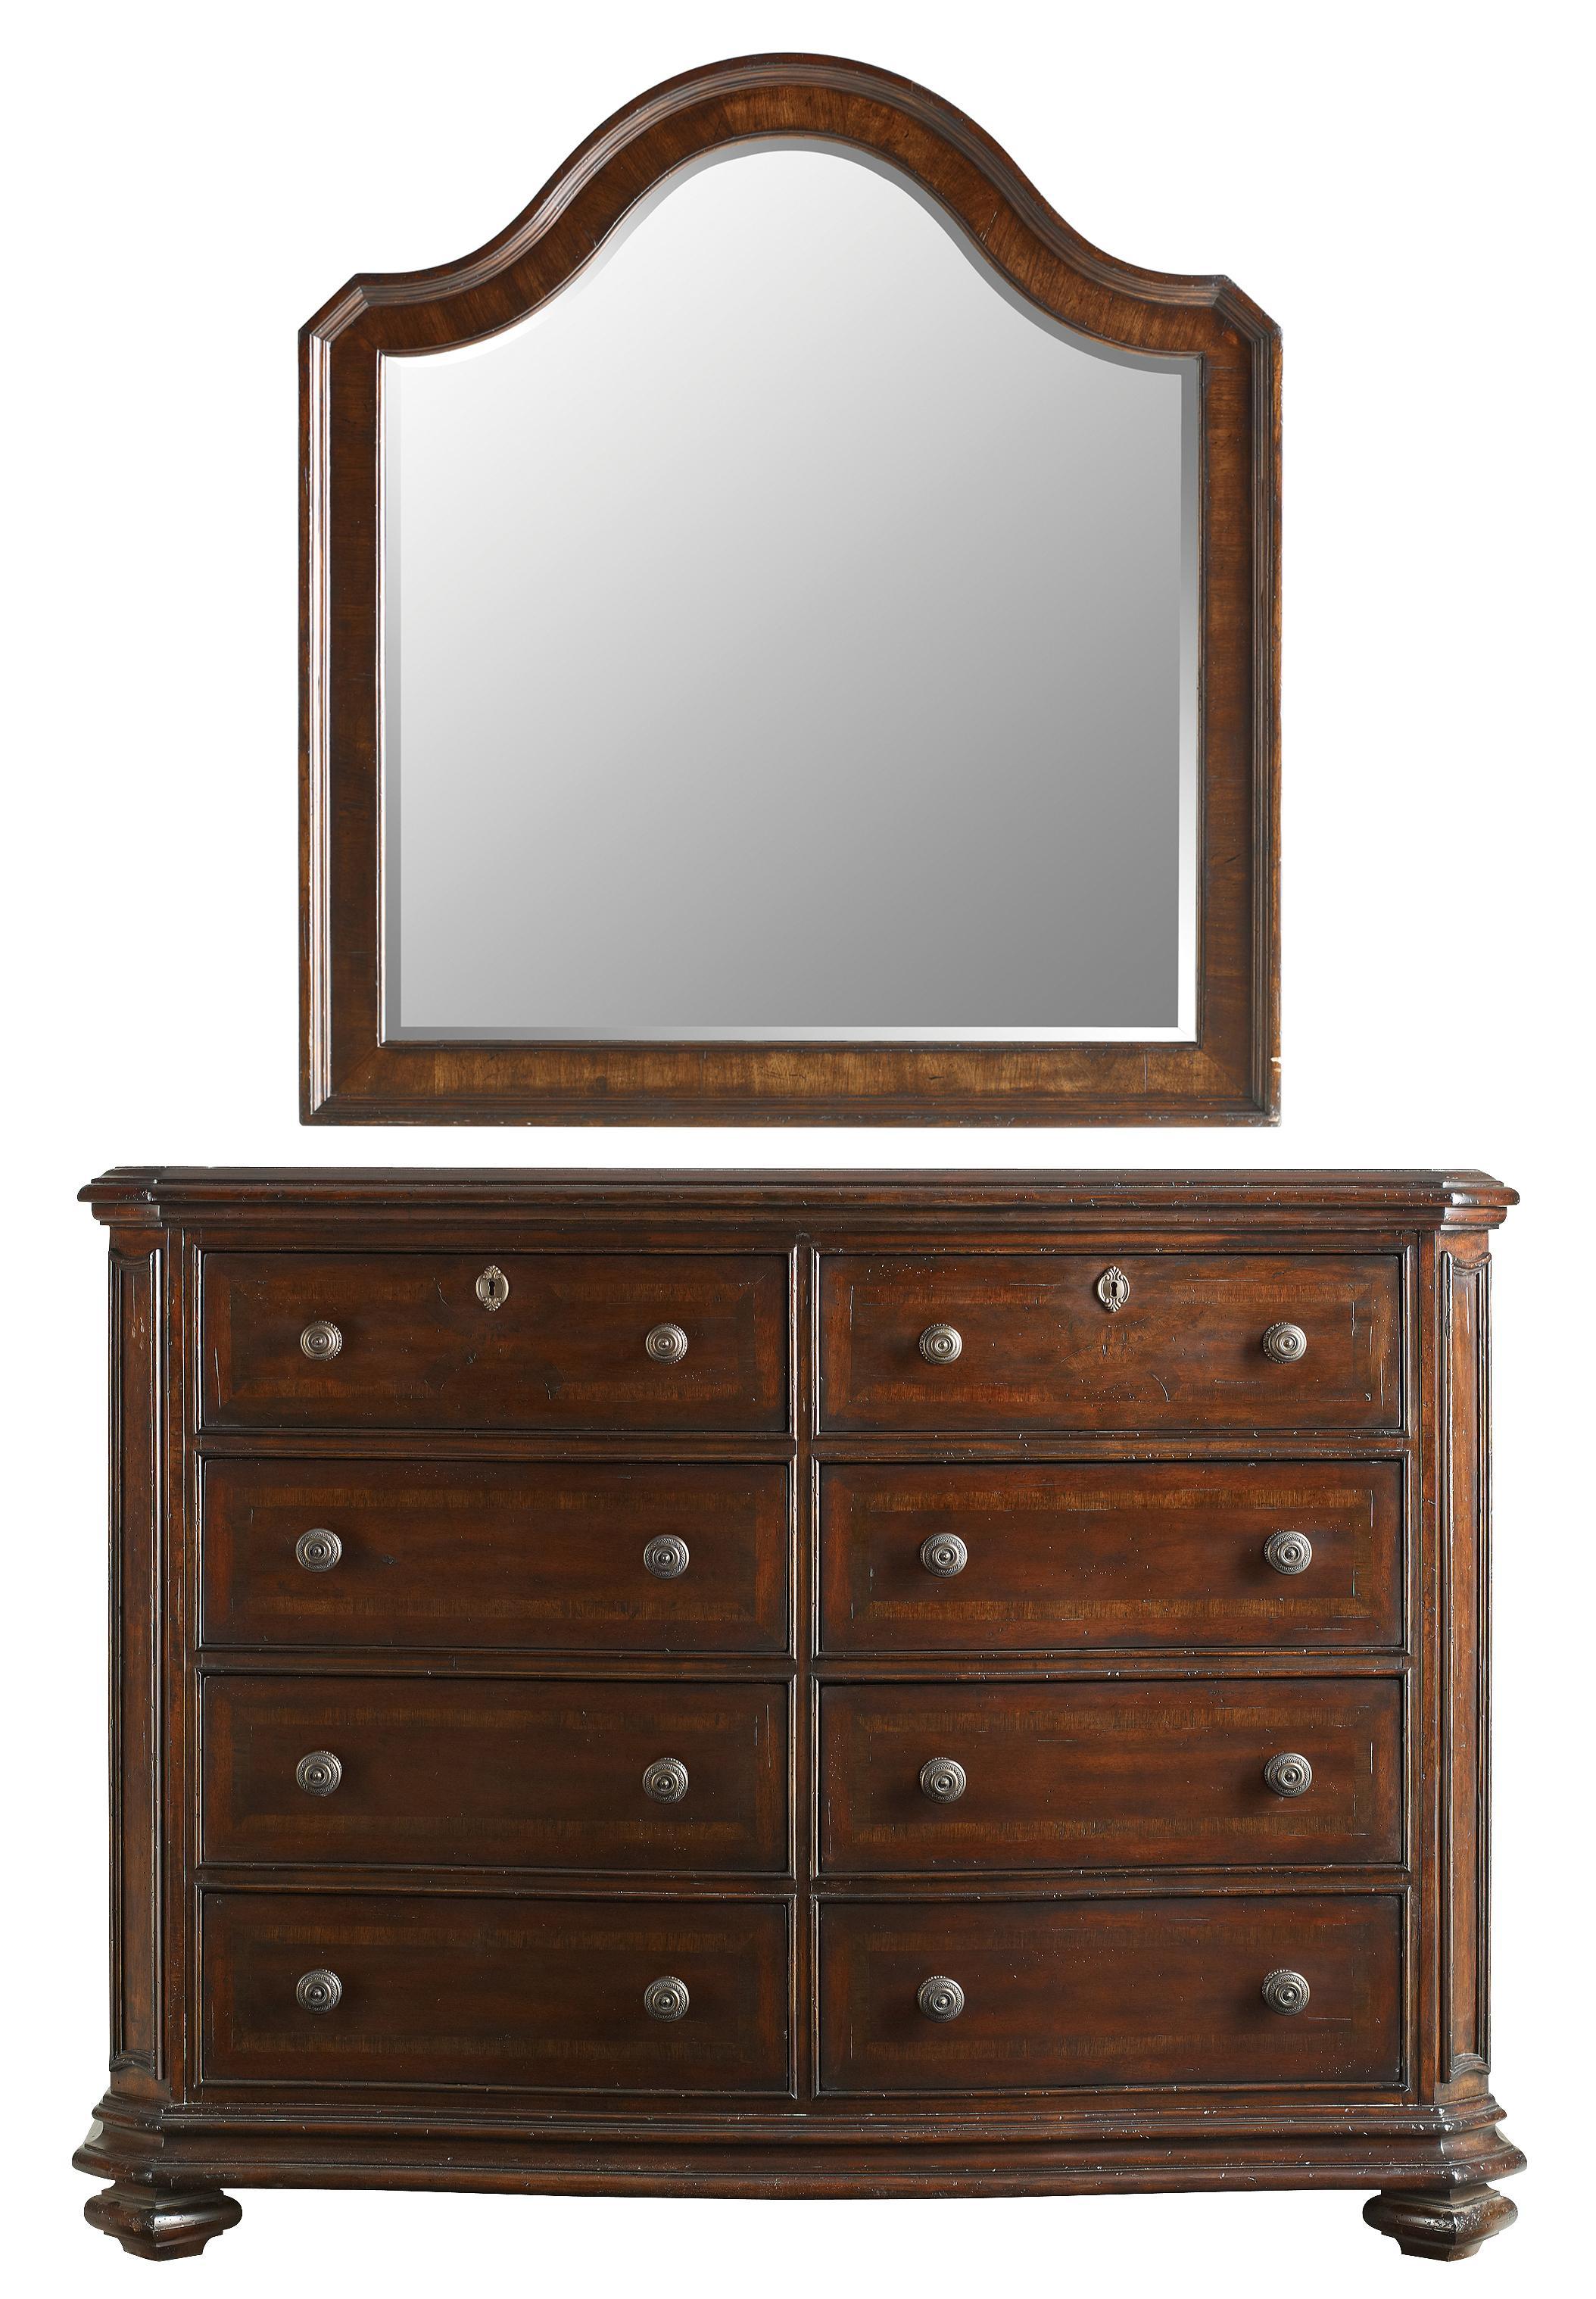 Stanley Furniture The Classic Portfolio Continental Double Dresser & Landscape Mirror - Item Number: 128-13-06+30